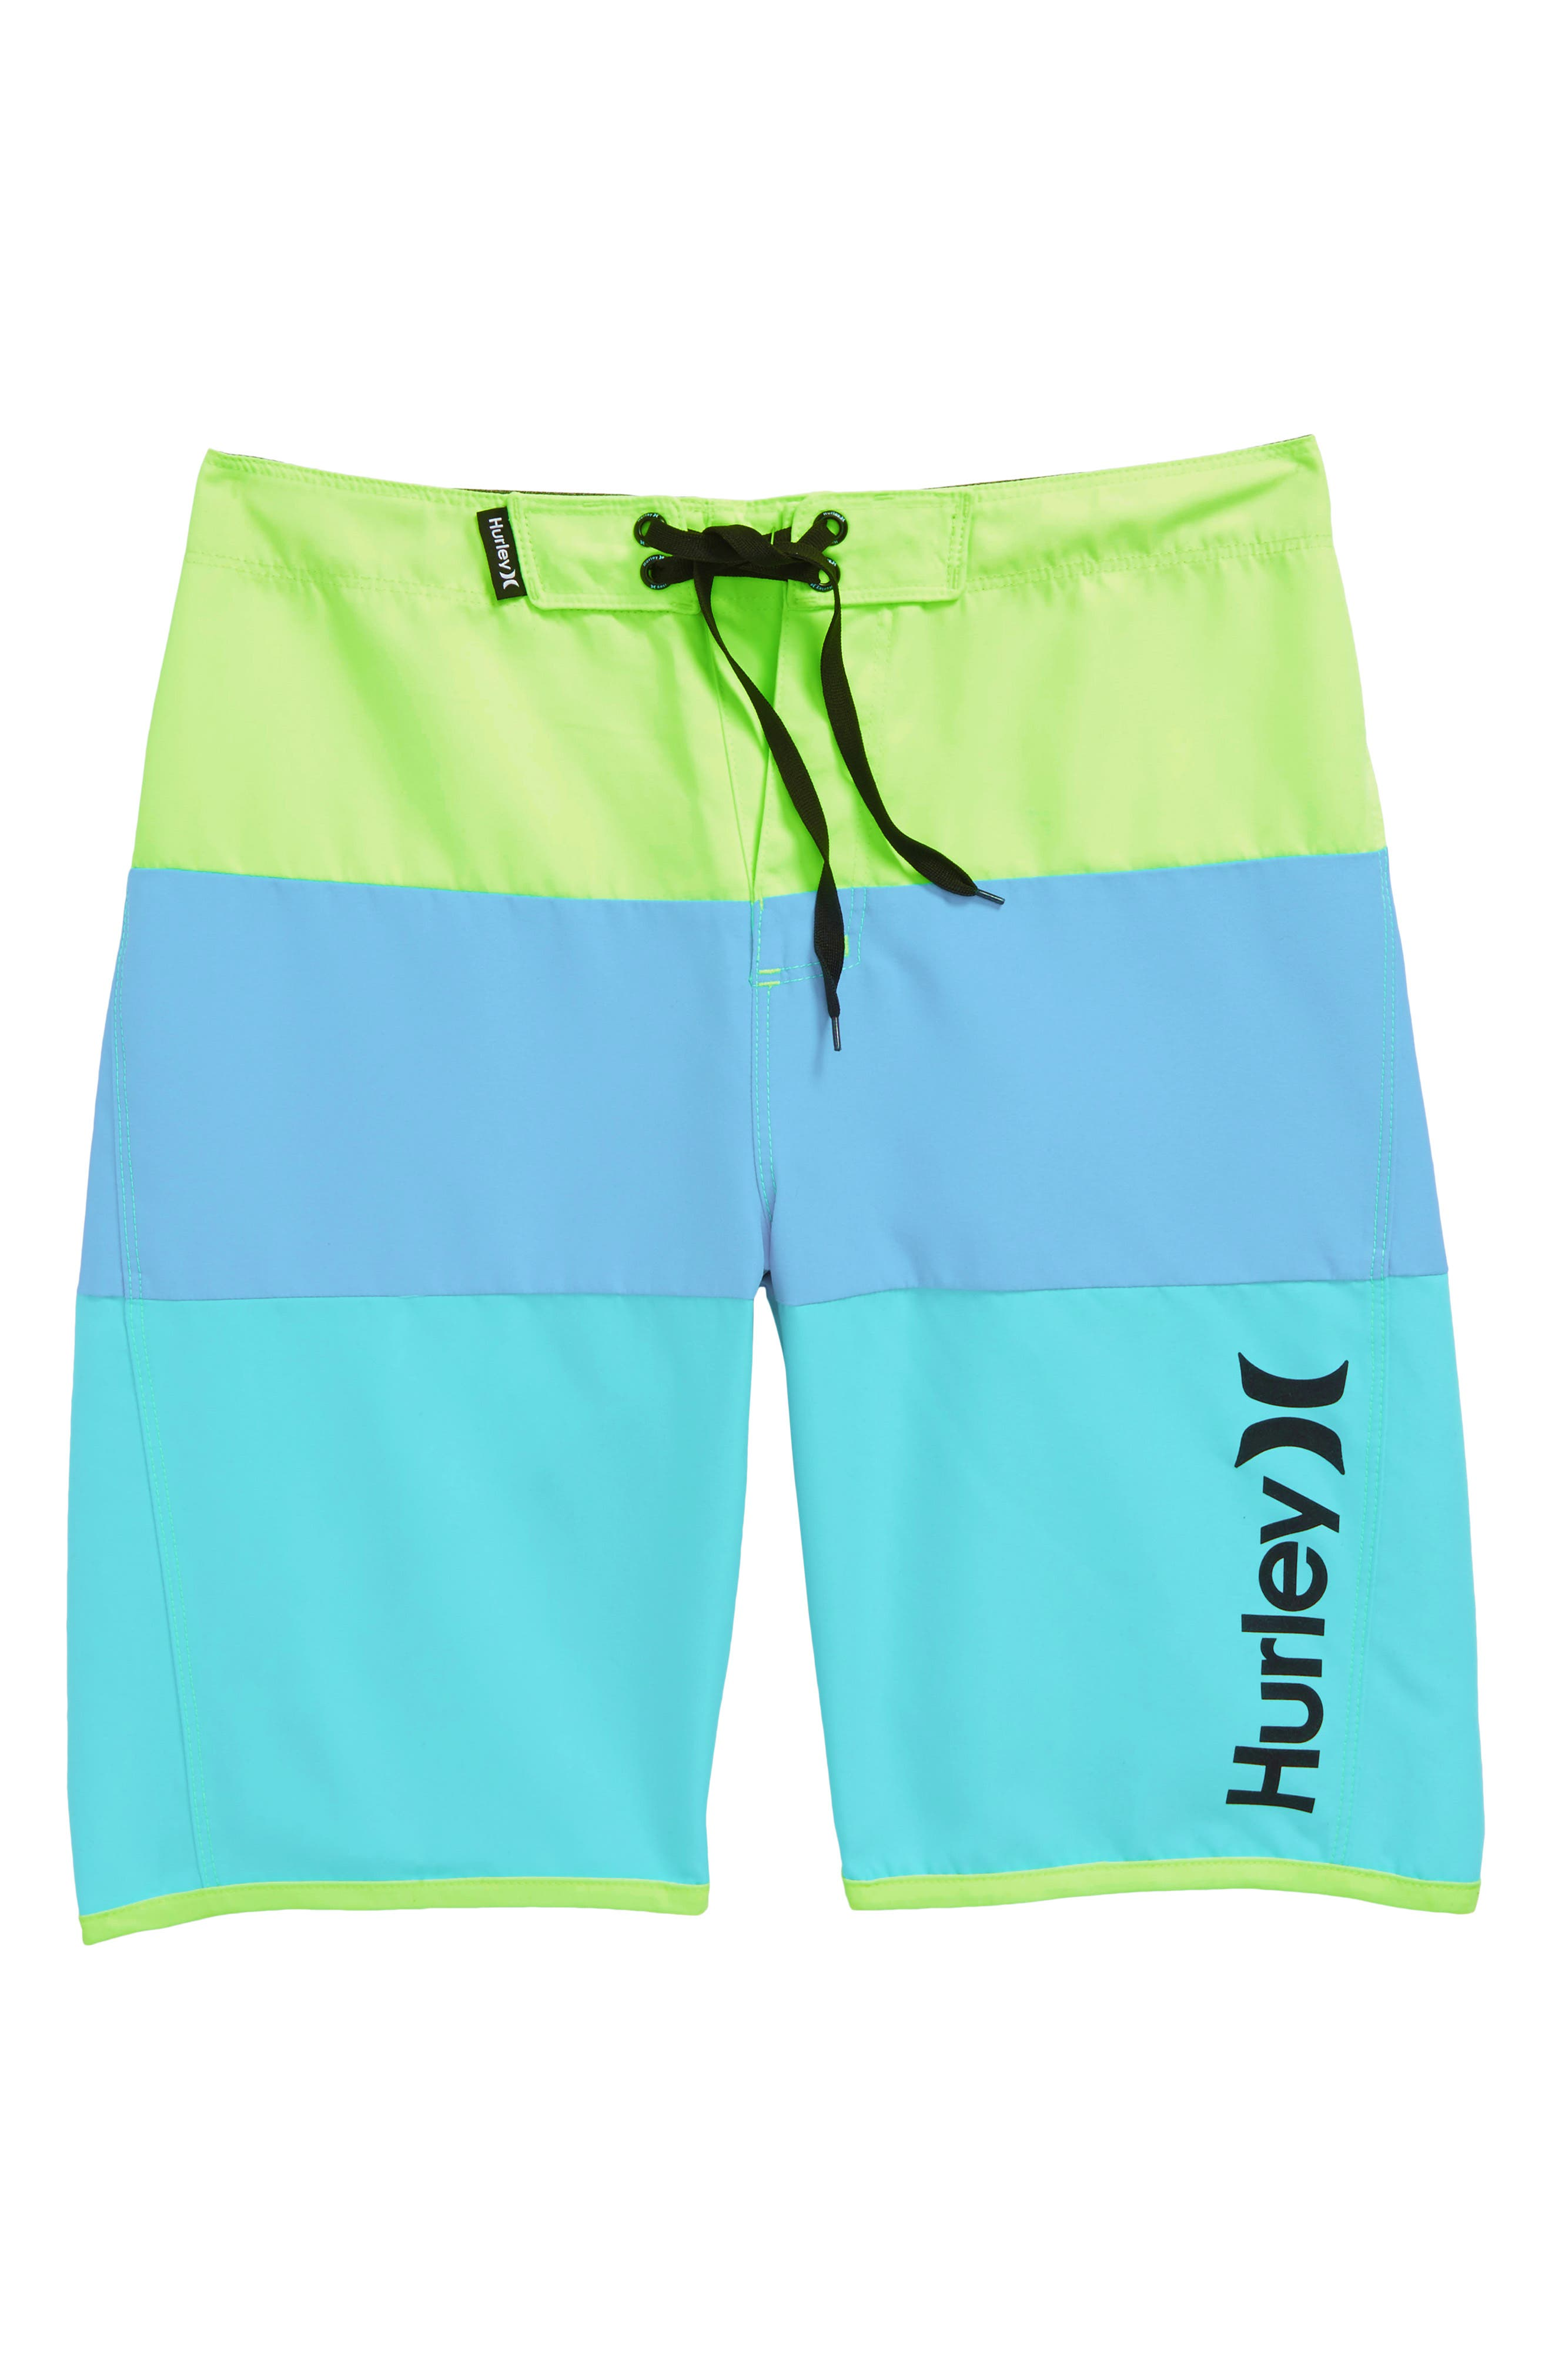 Triple Threat Board Shorts,                         Main,                         color, 361